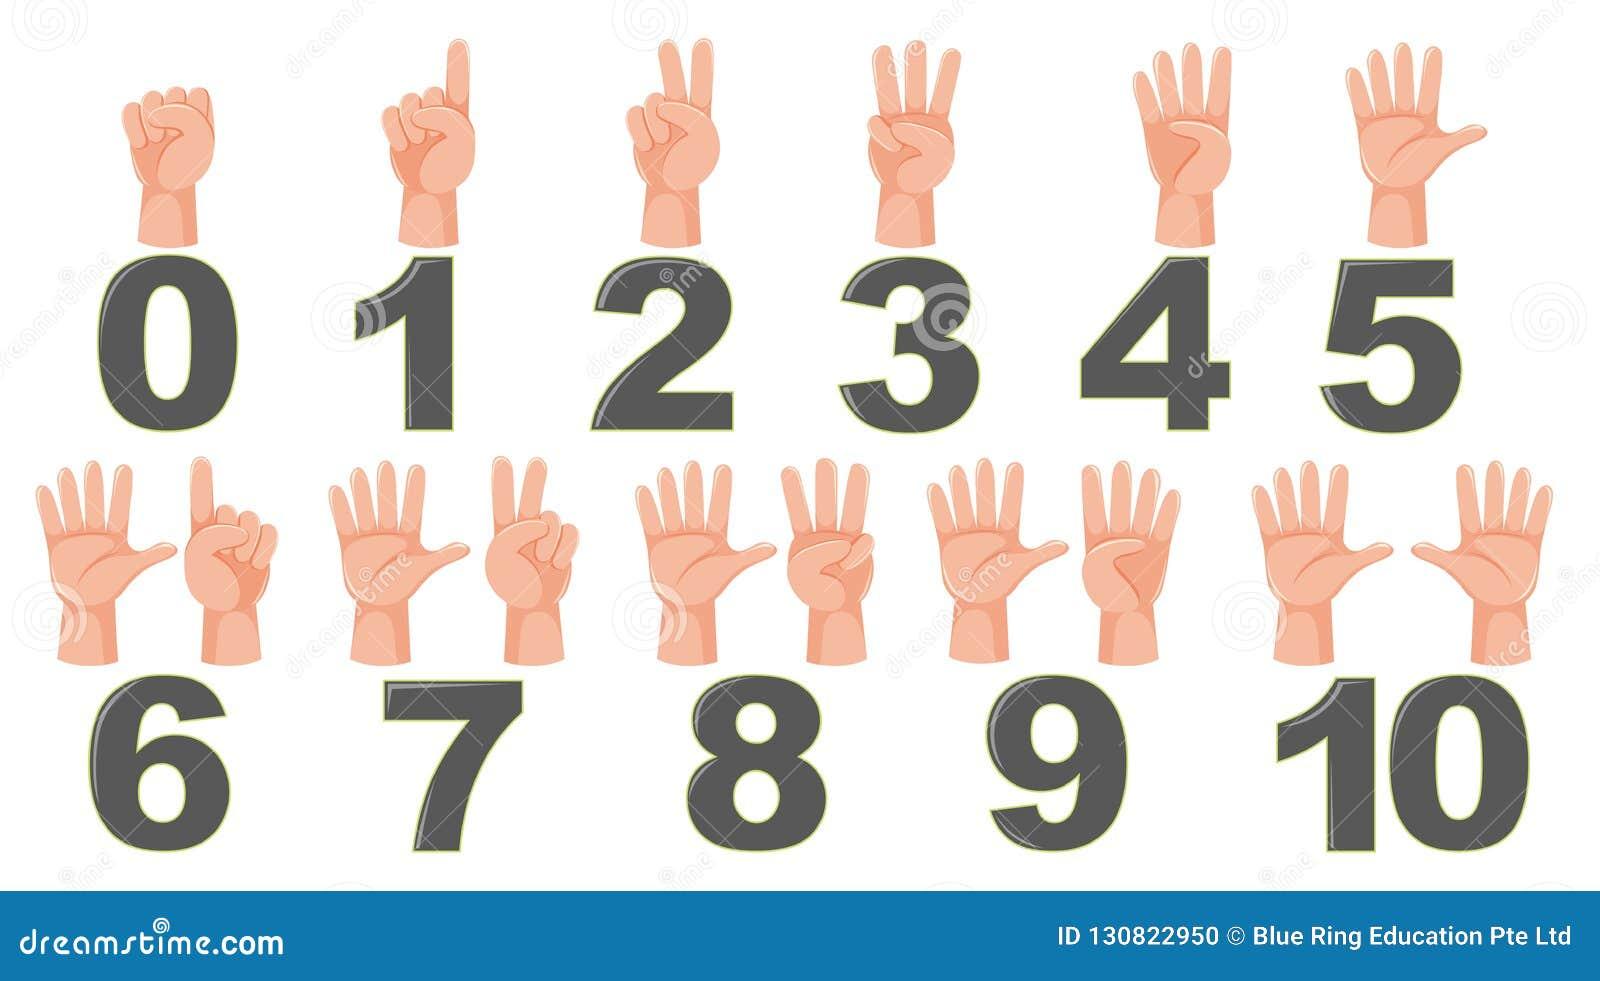 Math count finger gesture